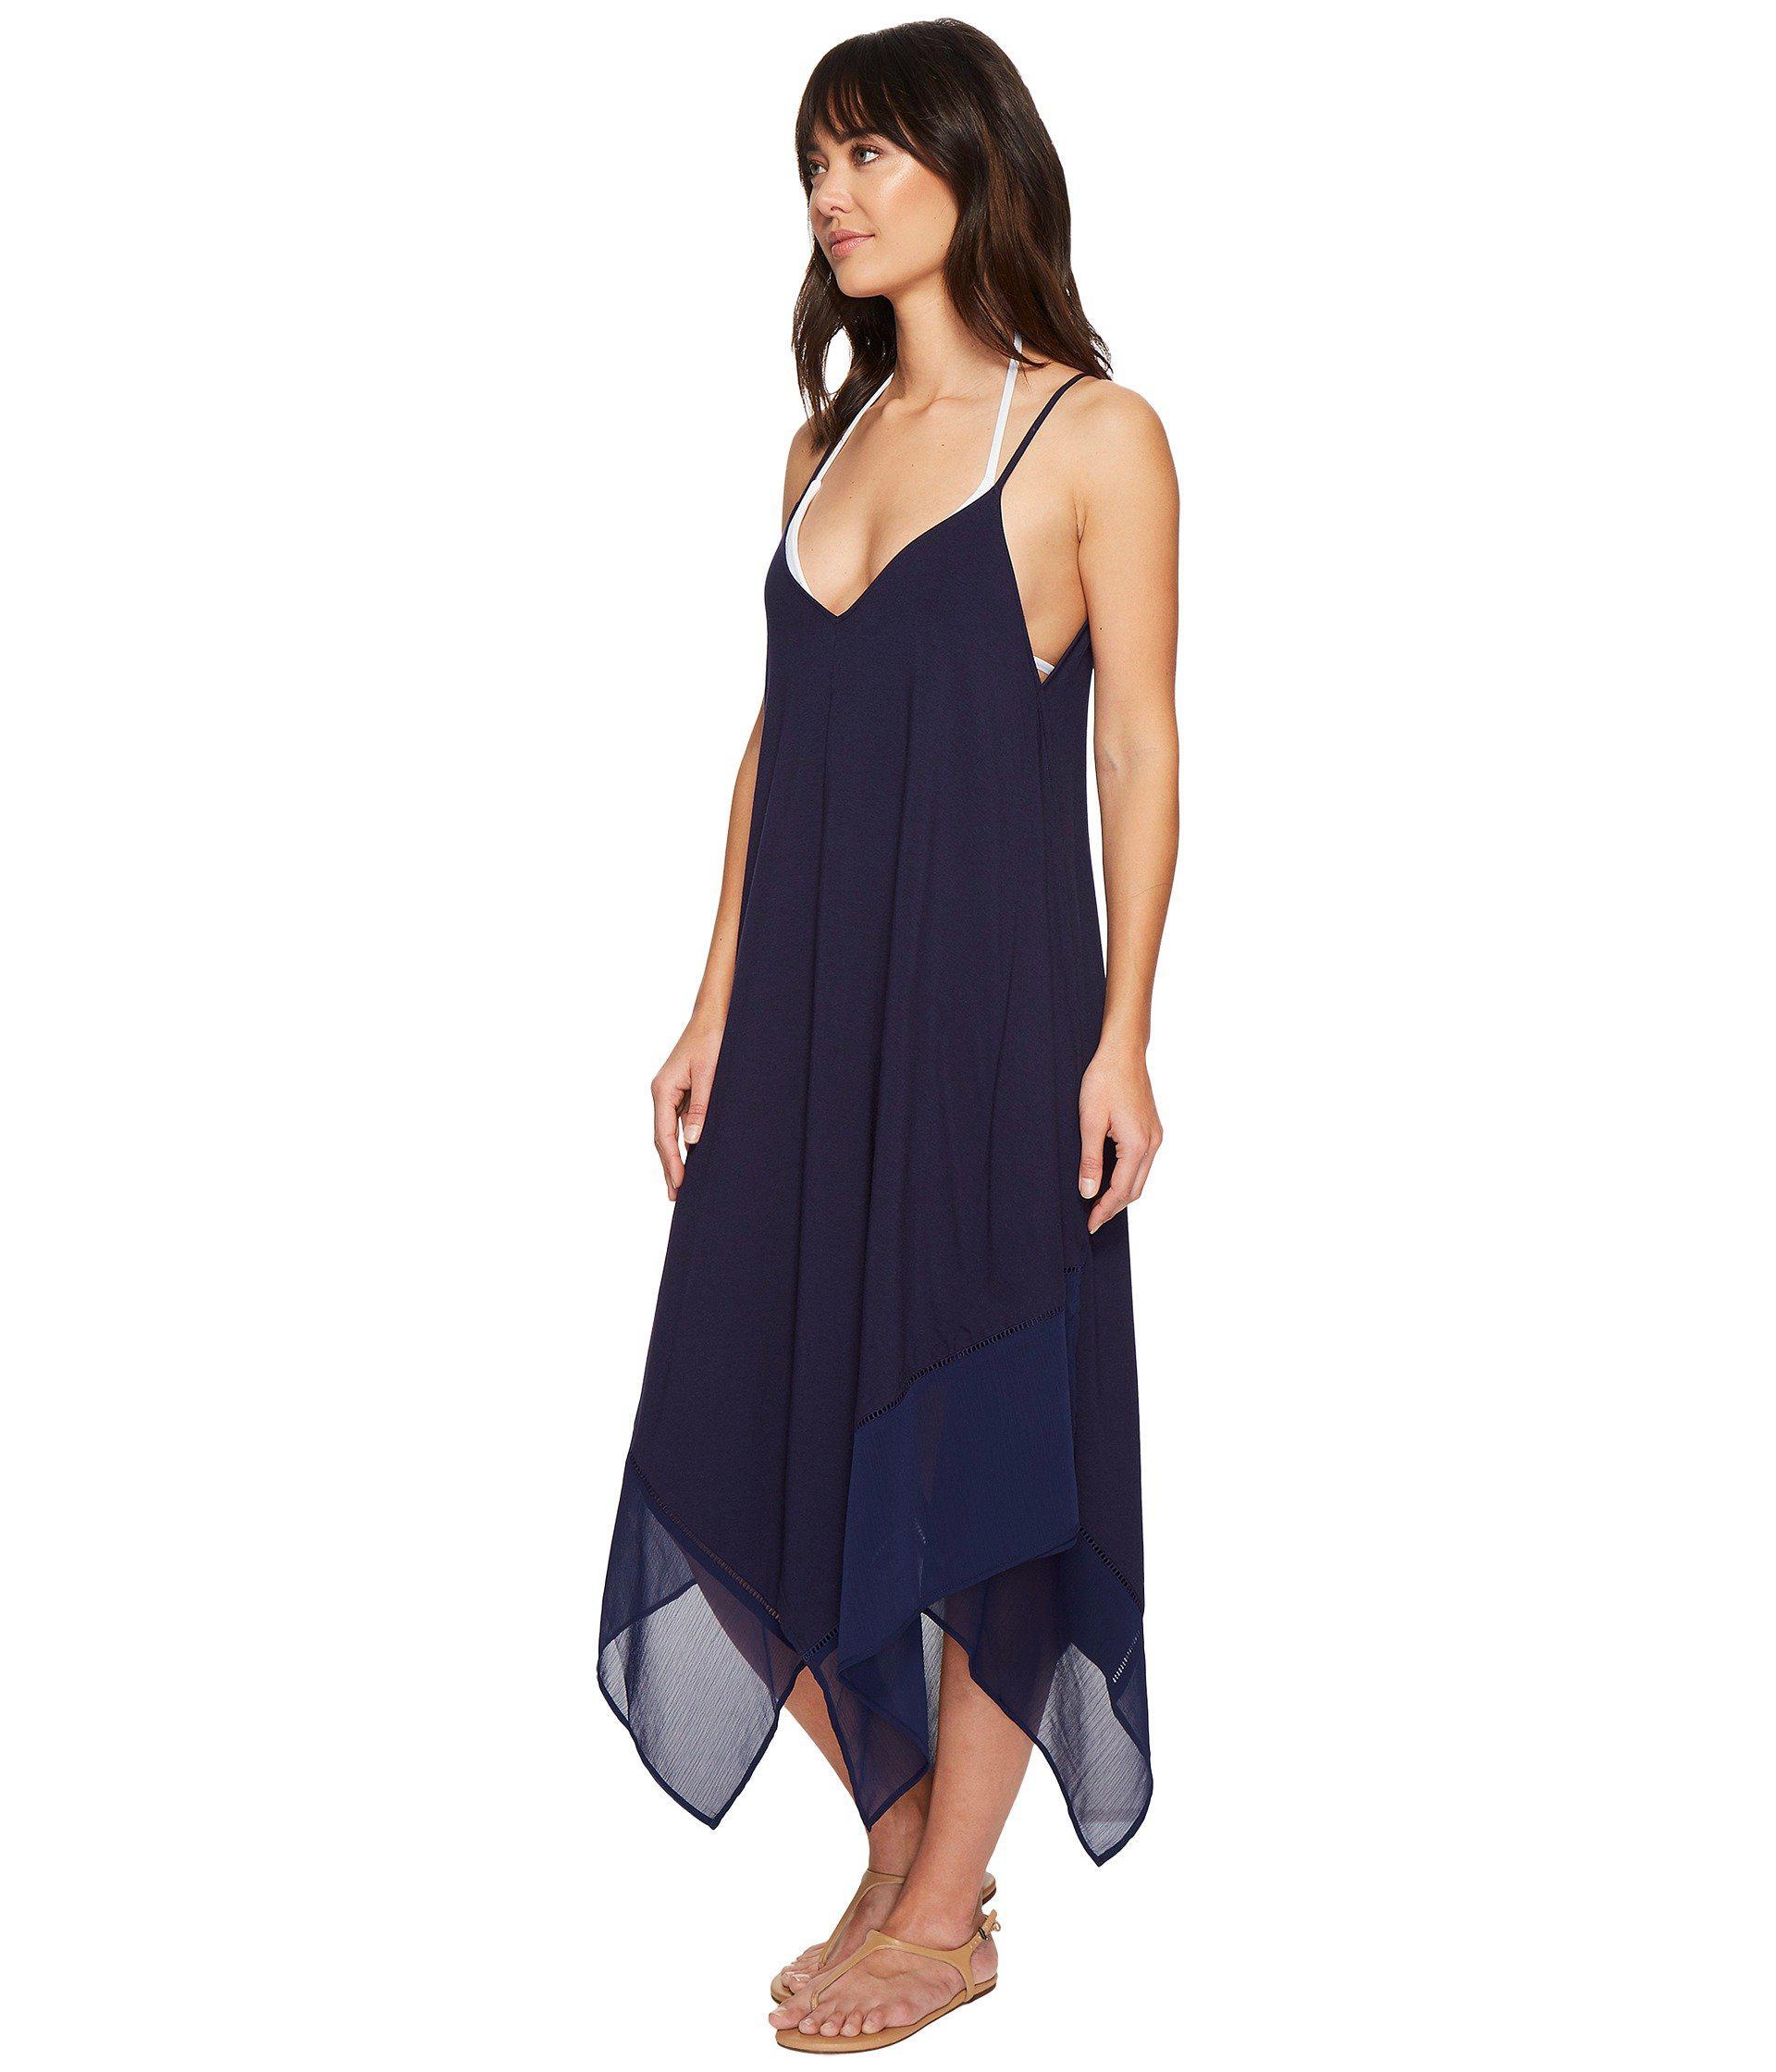 7554ee78d1 Lyst - Tommy Bahama Cotton Modal Scarf Dress Cover-up (black) Women s  Swimwear in Blue